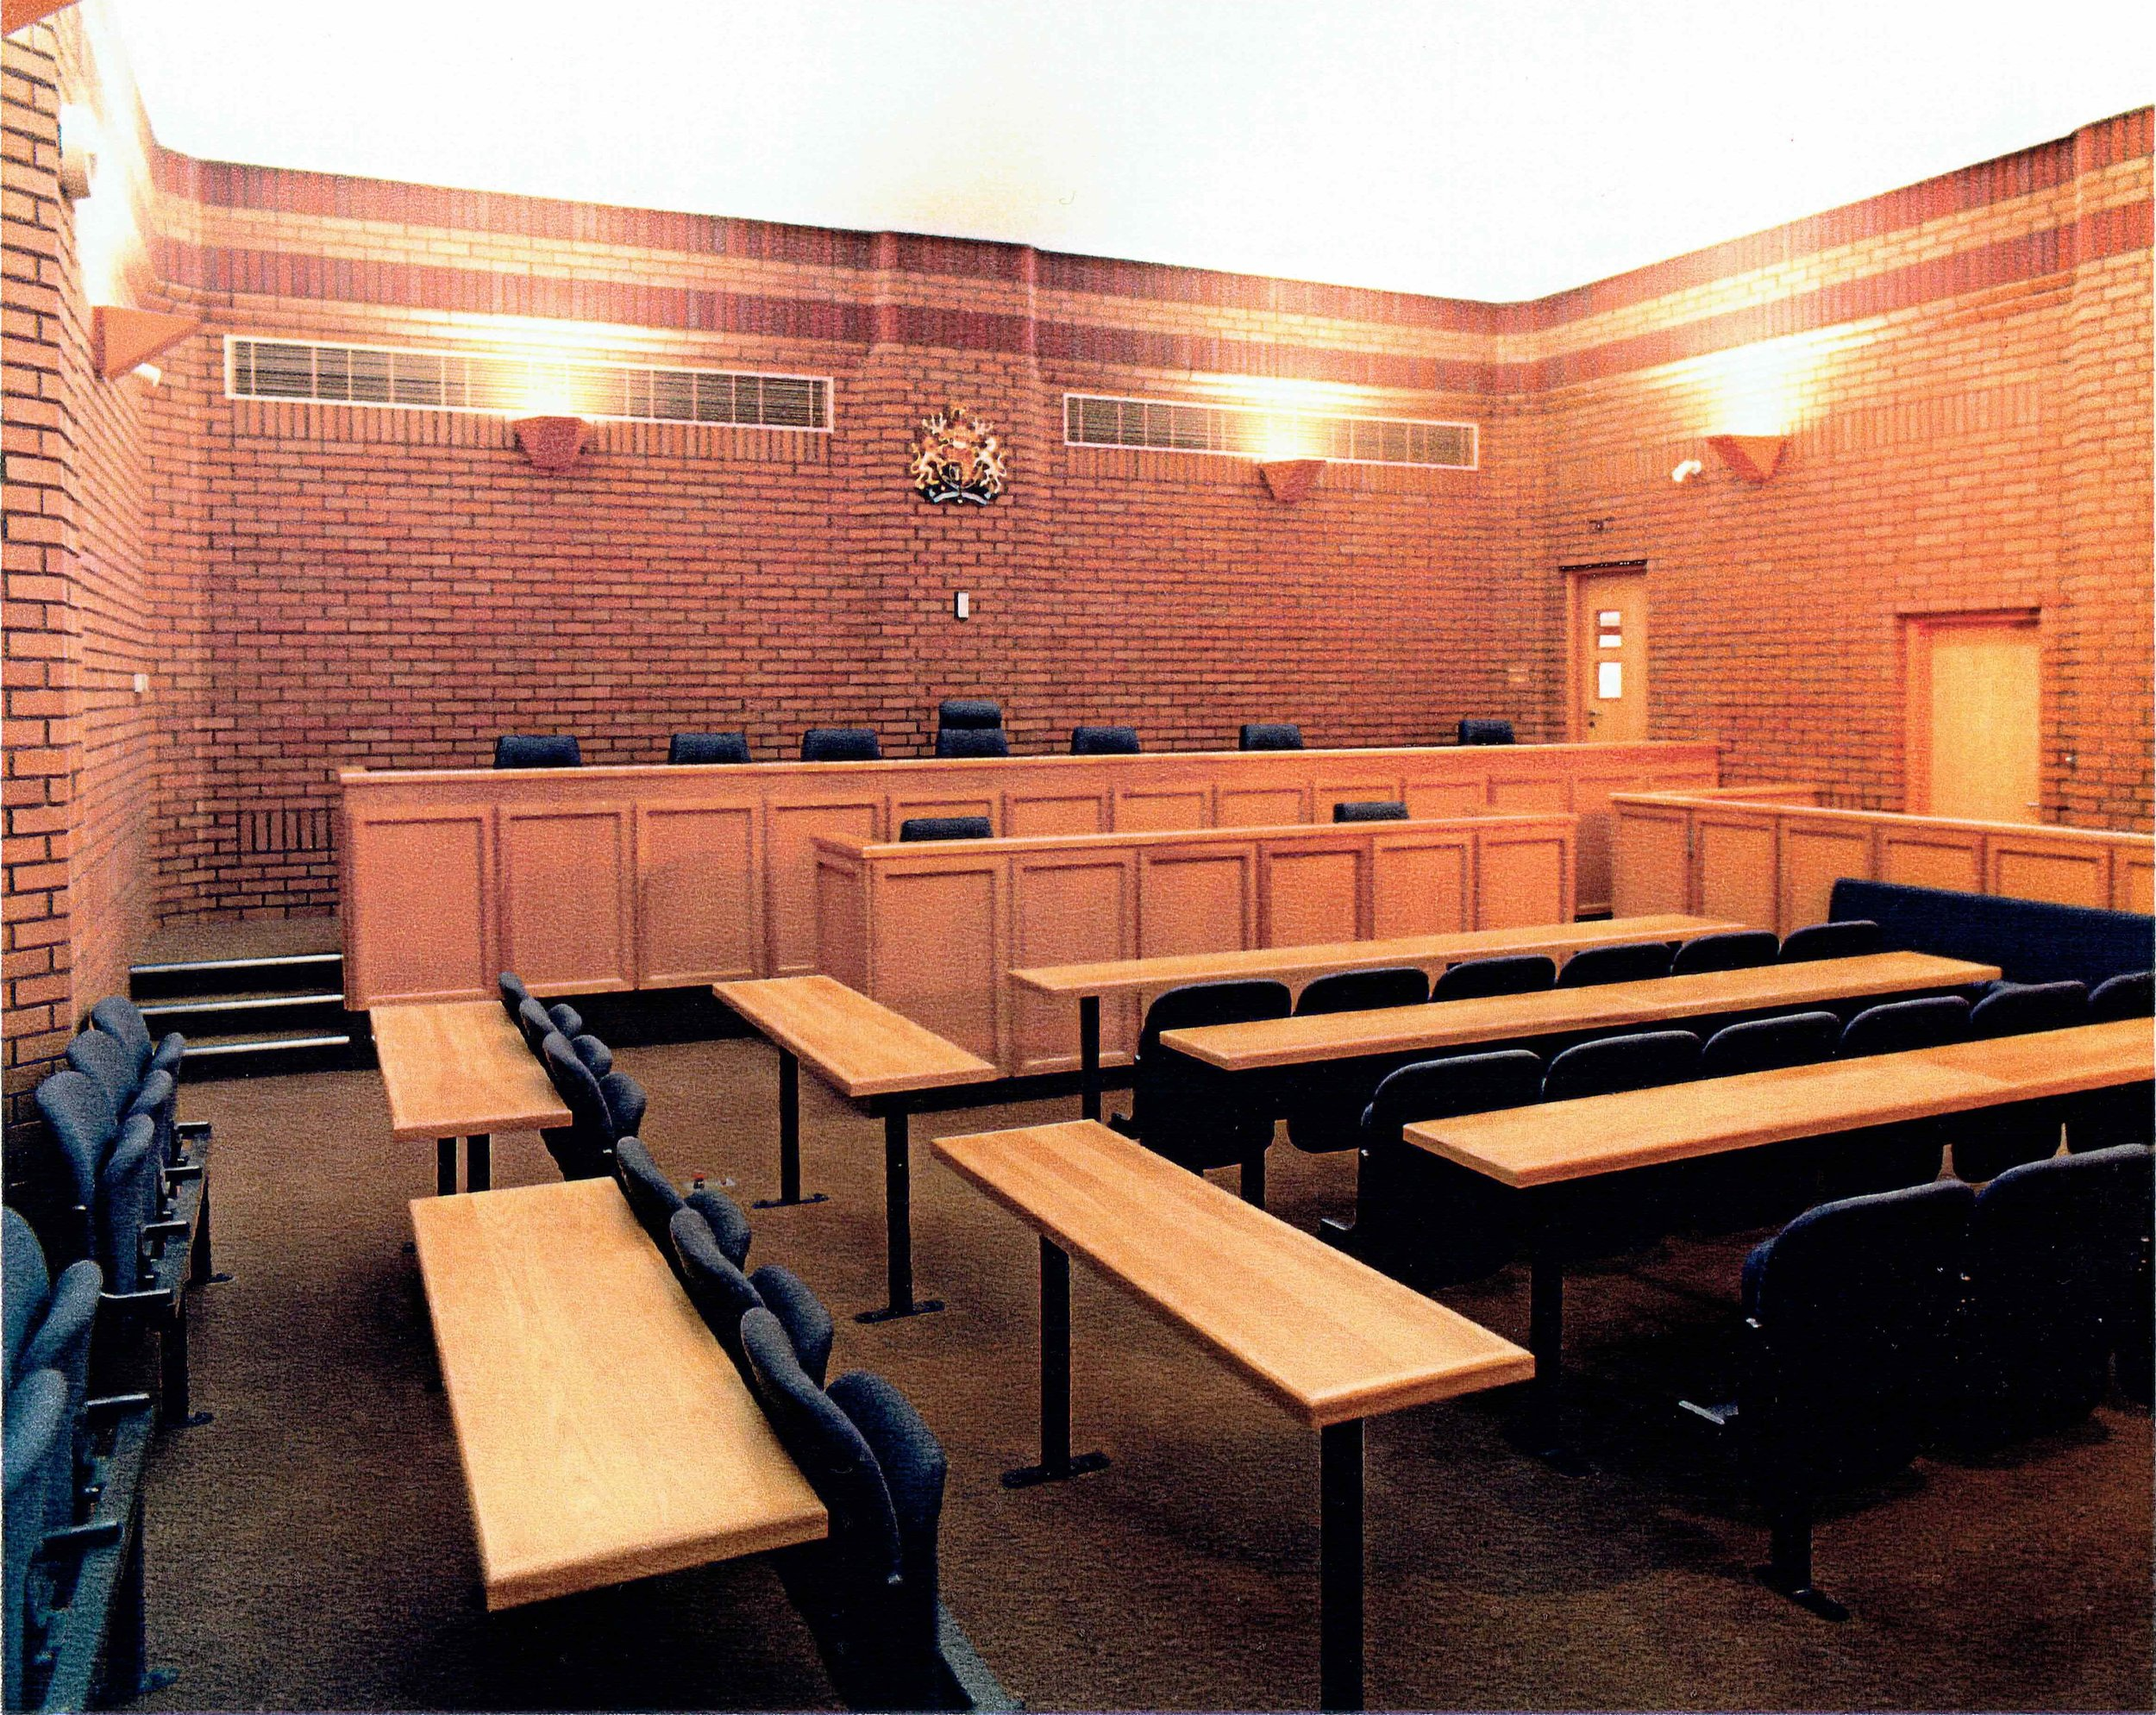 Magistrates'Court - Merton, London